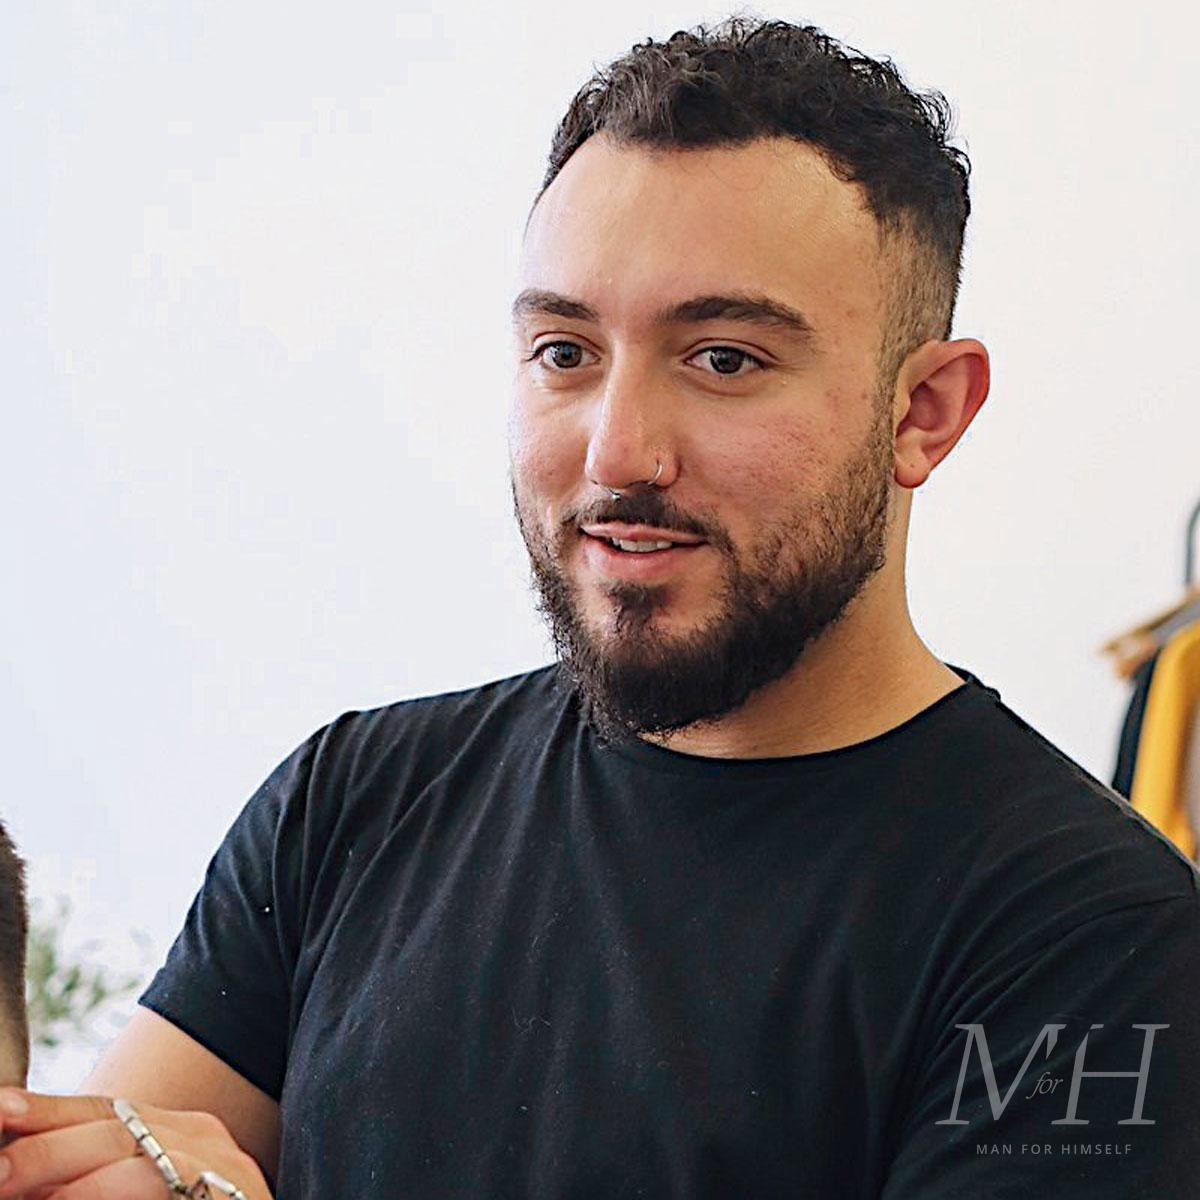 berks-barber-ask-the-barber-man-for-himself